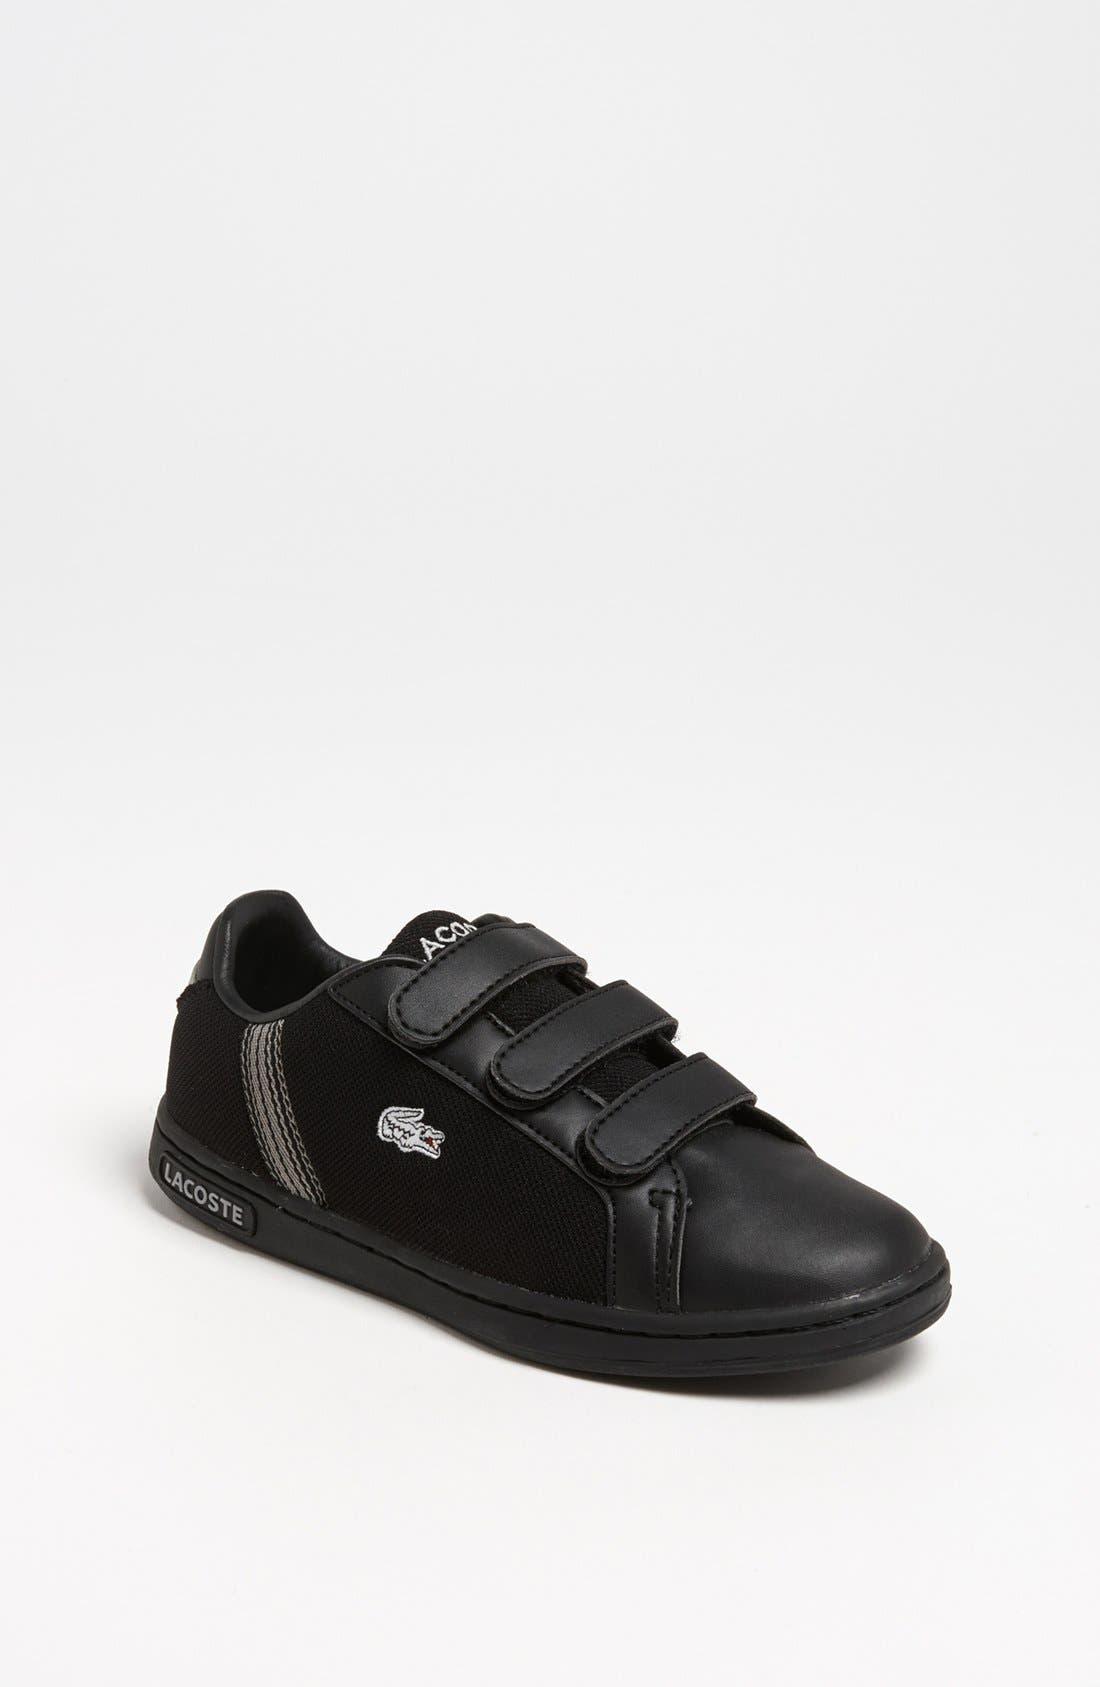 Main Image - Lacoste 'Renard' Sneaker (Toddler & Little Kid)